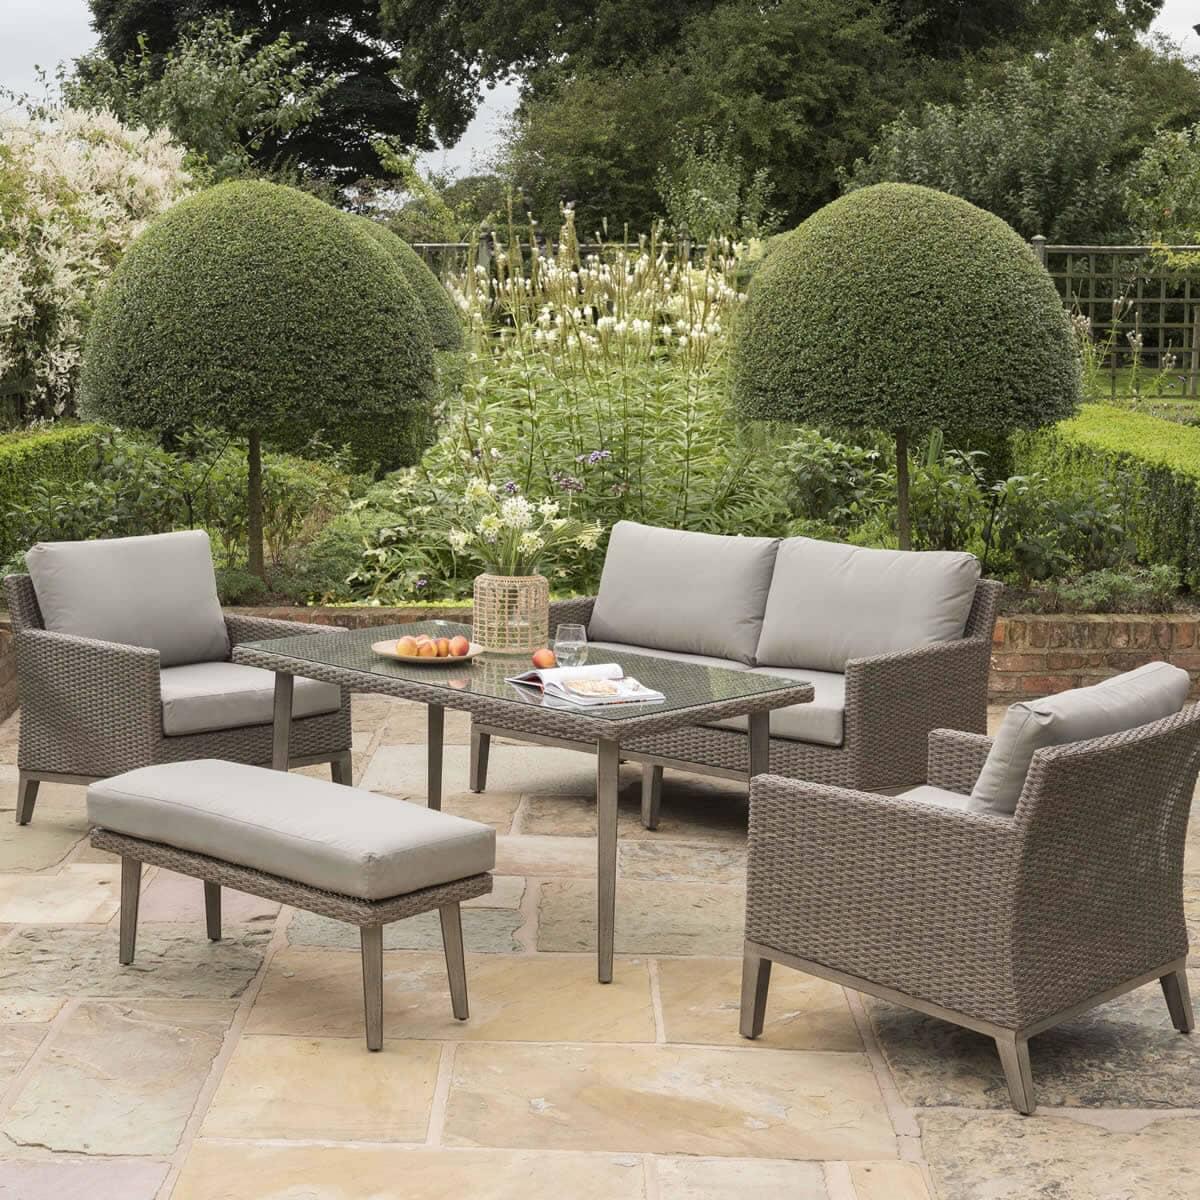 Kettler Merida Sofa Set - (0194411-4009C) - Garden ...